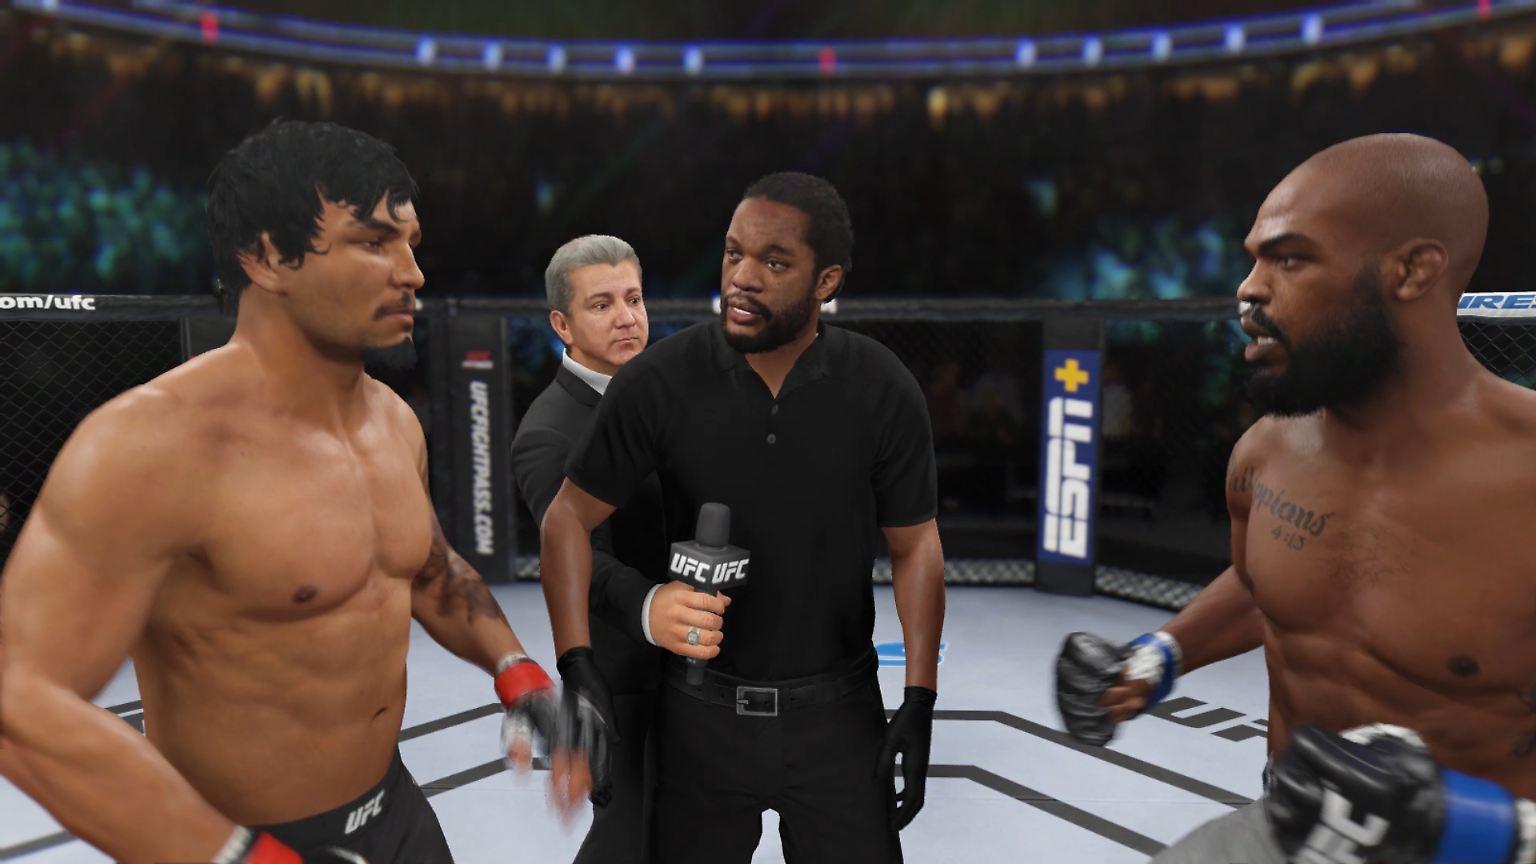 UFC 4 - 202005321 - 2020-08-16 15-00-18.mp4.00_13_54_14.Standbild015.jpg